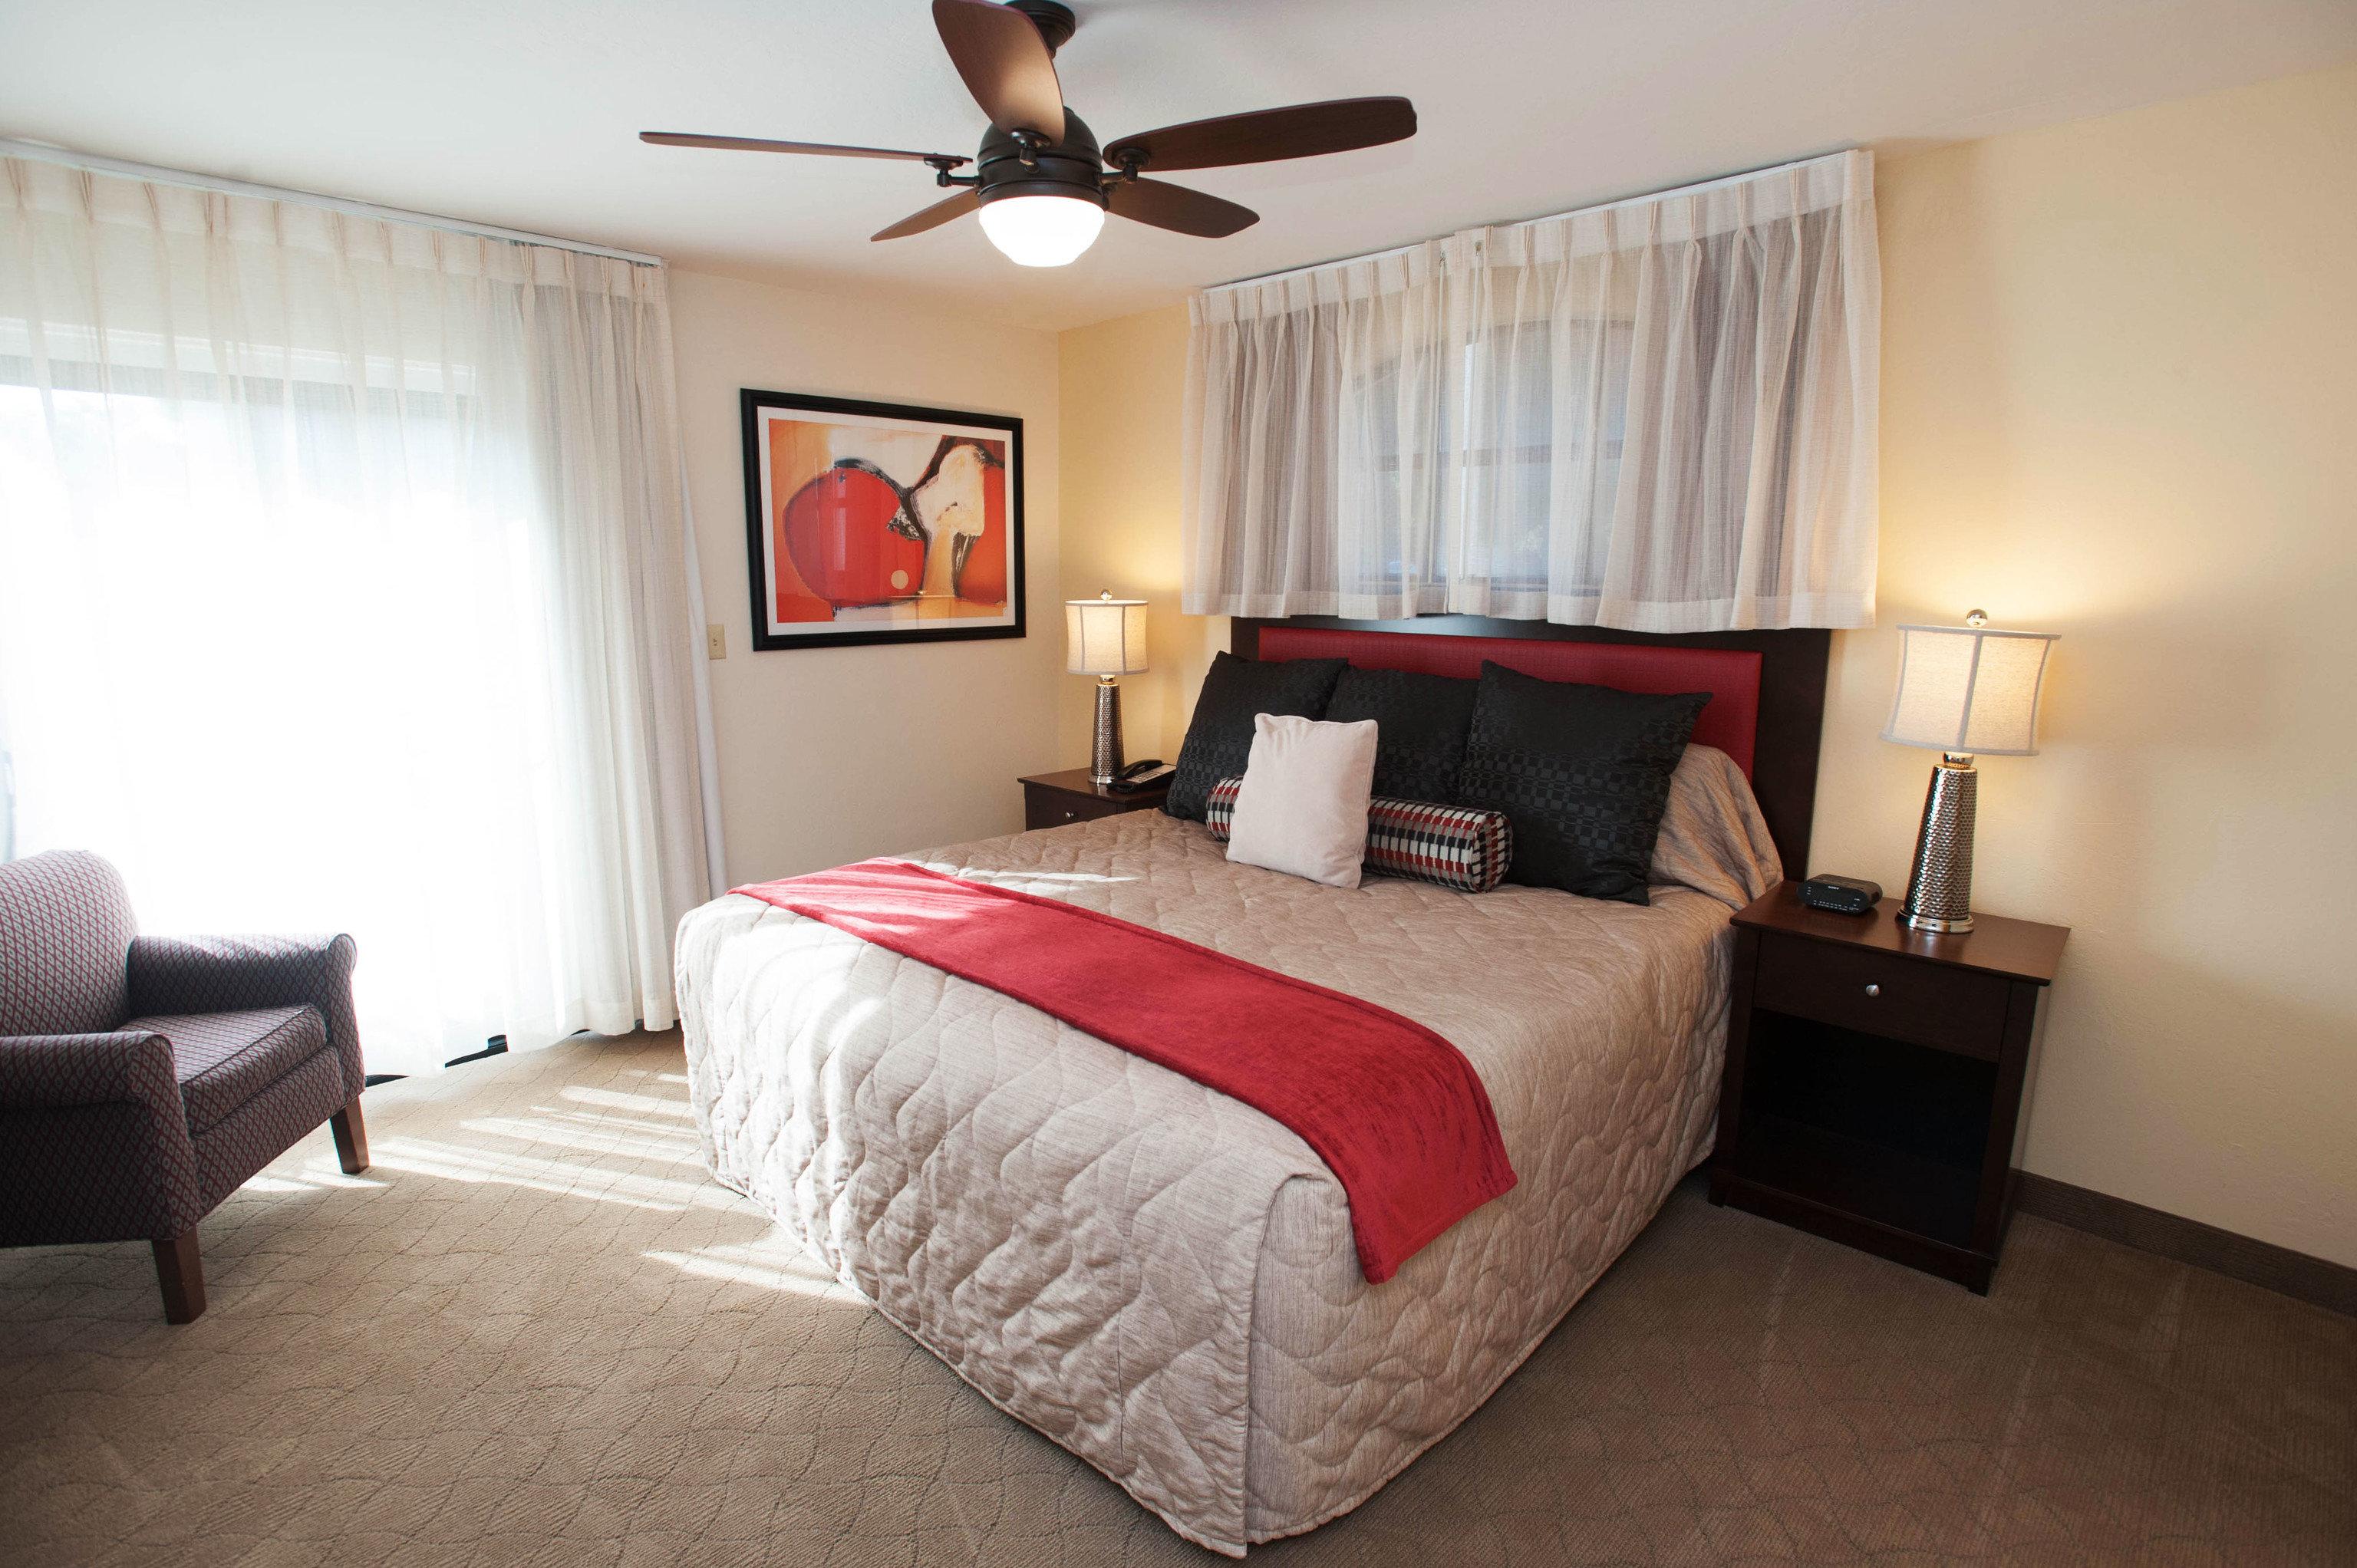 sofa Bedroom red property Suite cottage